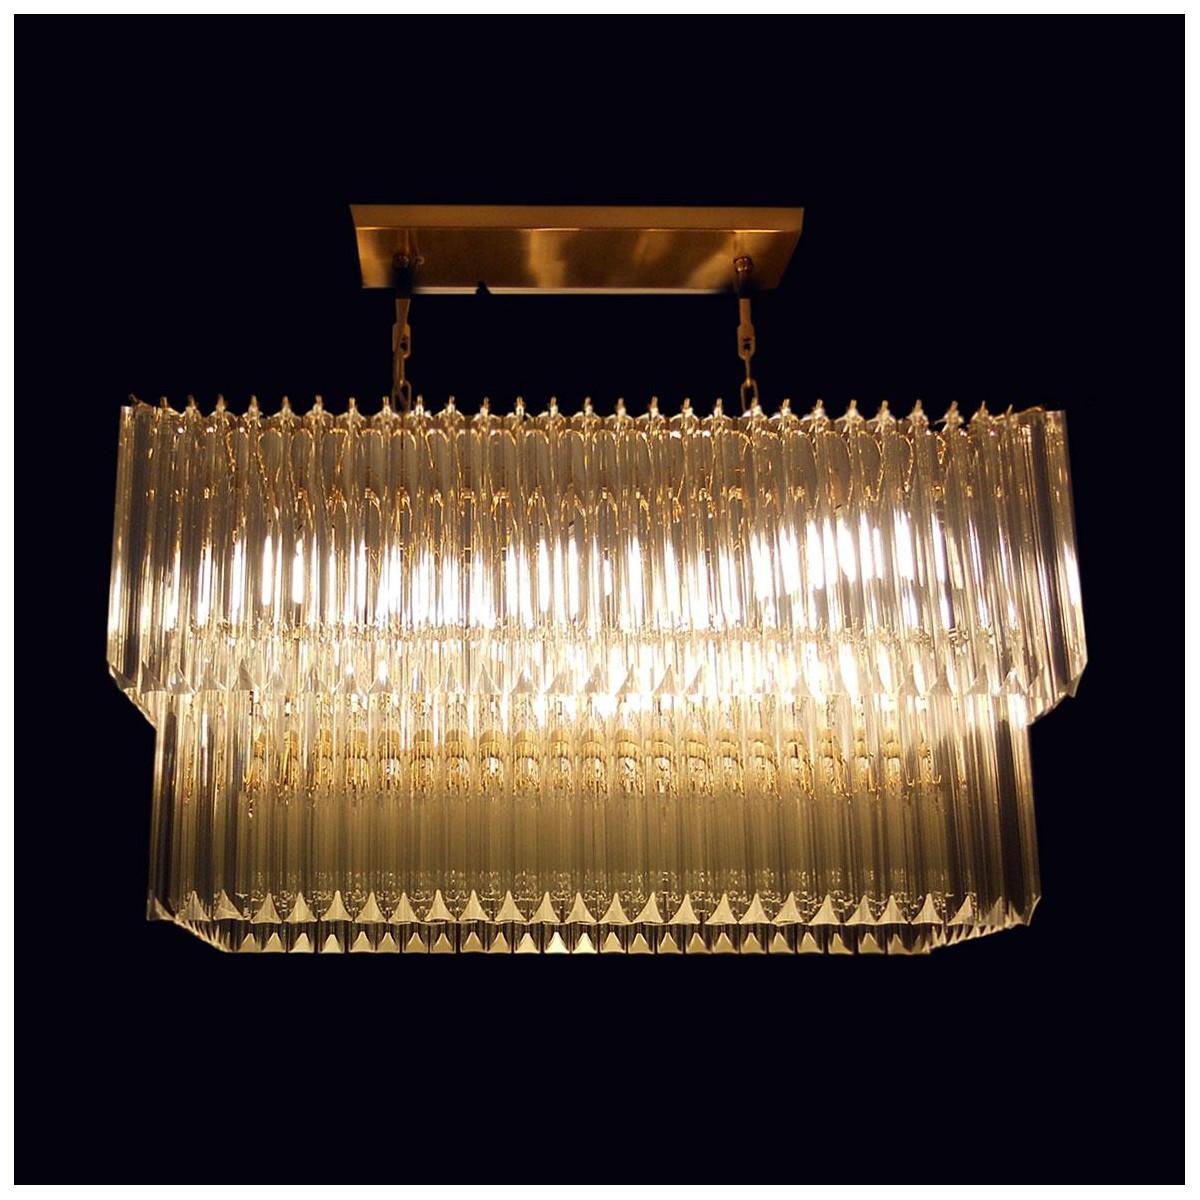 """Anita"" lustre en cristal de Murano - 10 lumières - transparent et or 24 carats"